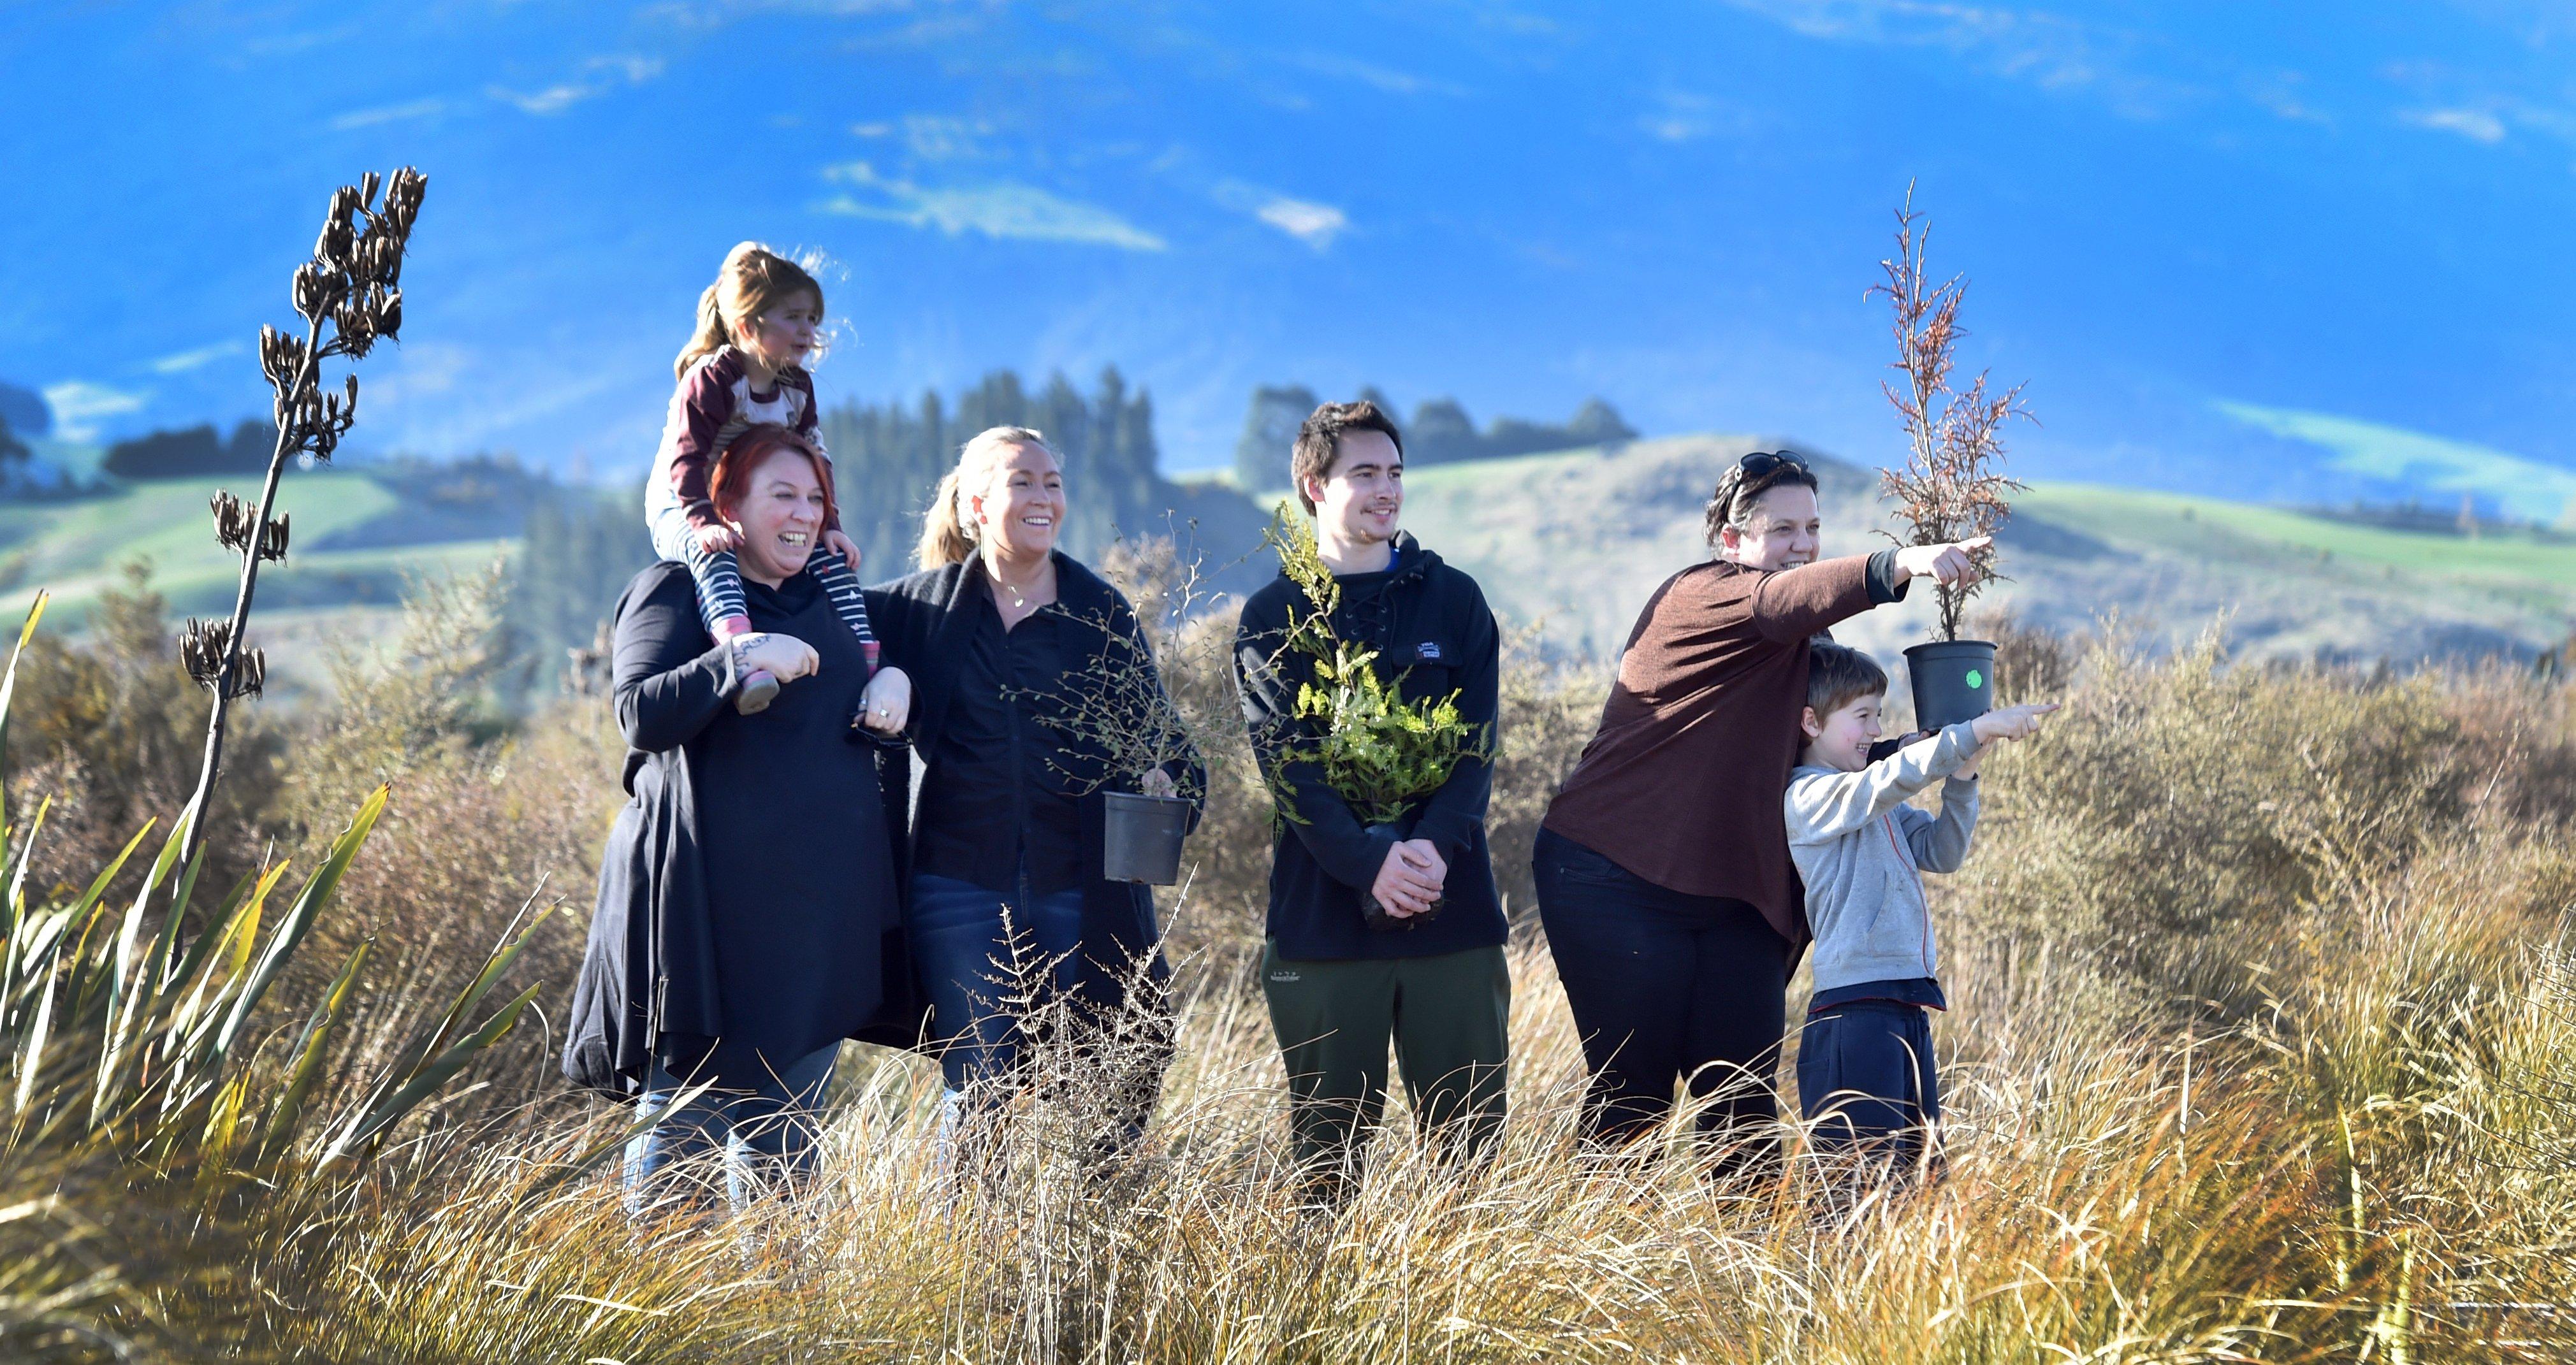 Surveying potential planting sites for native shrubs are Te Runanga o Otakou members (from left)...